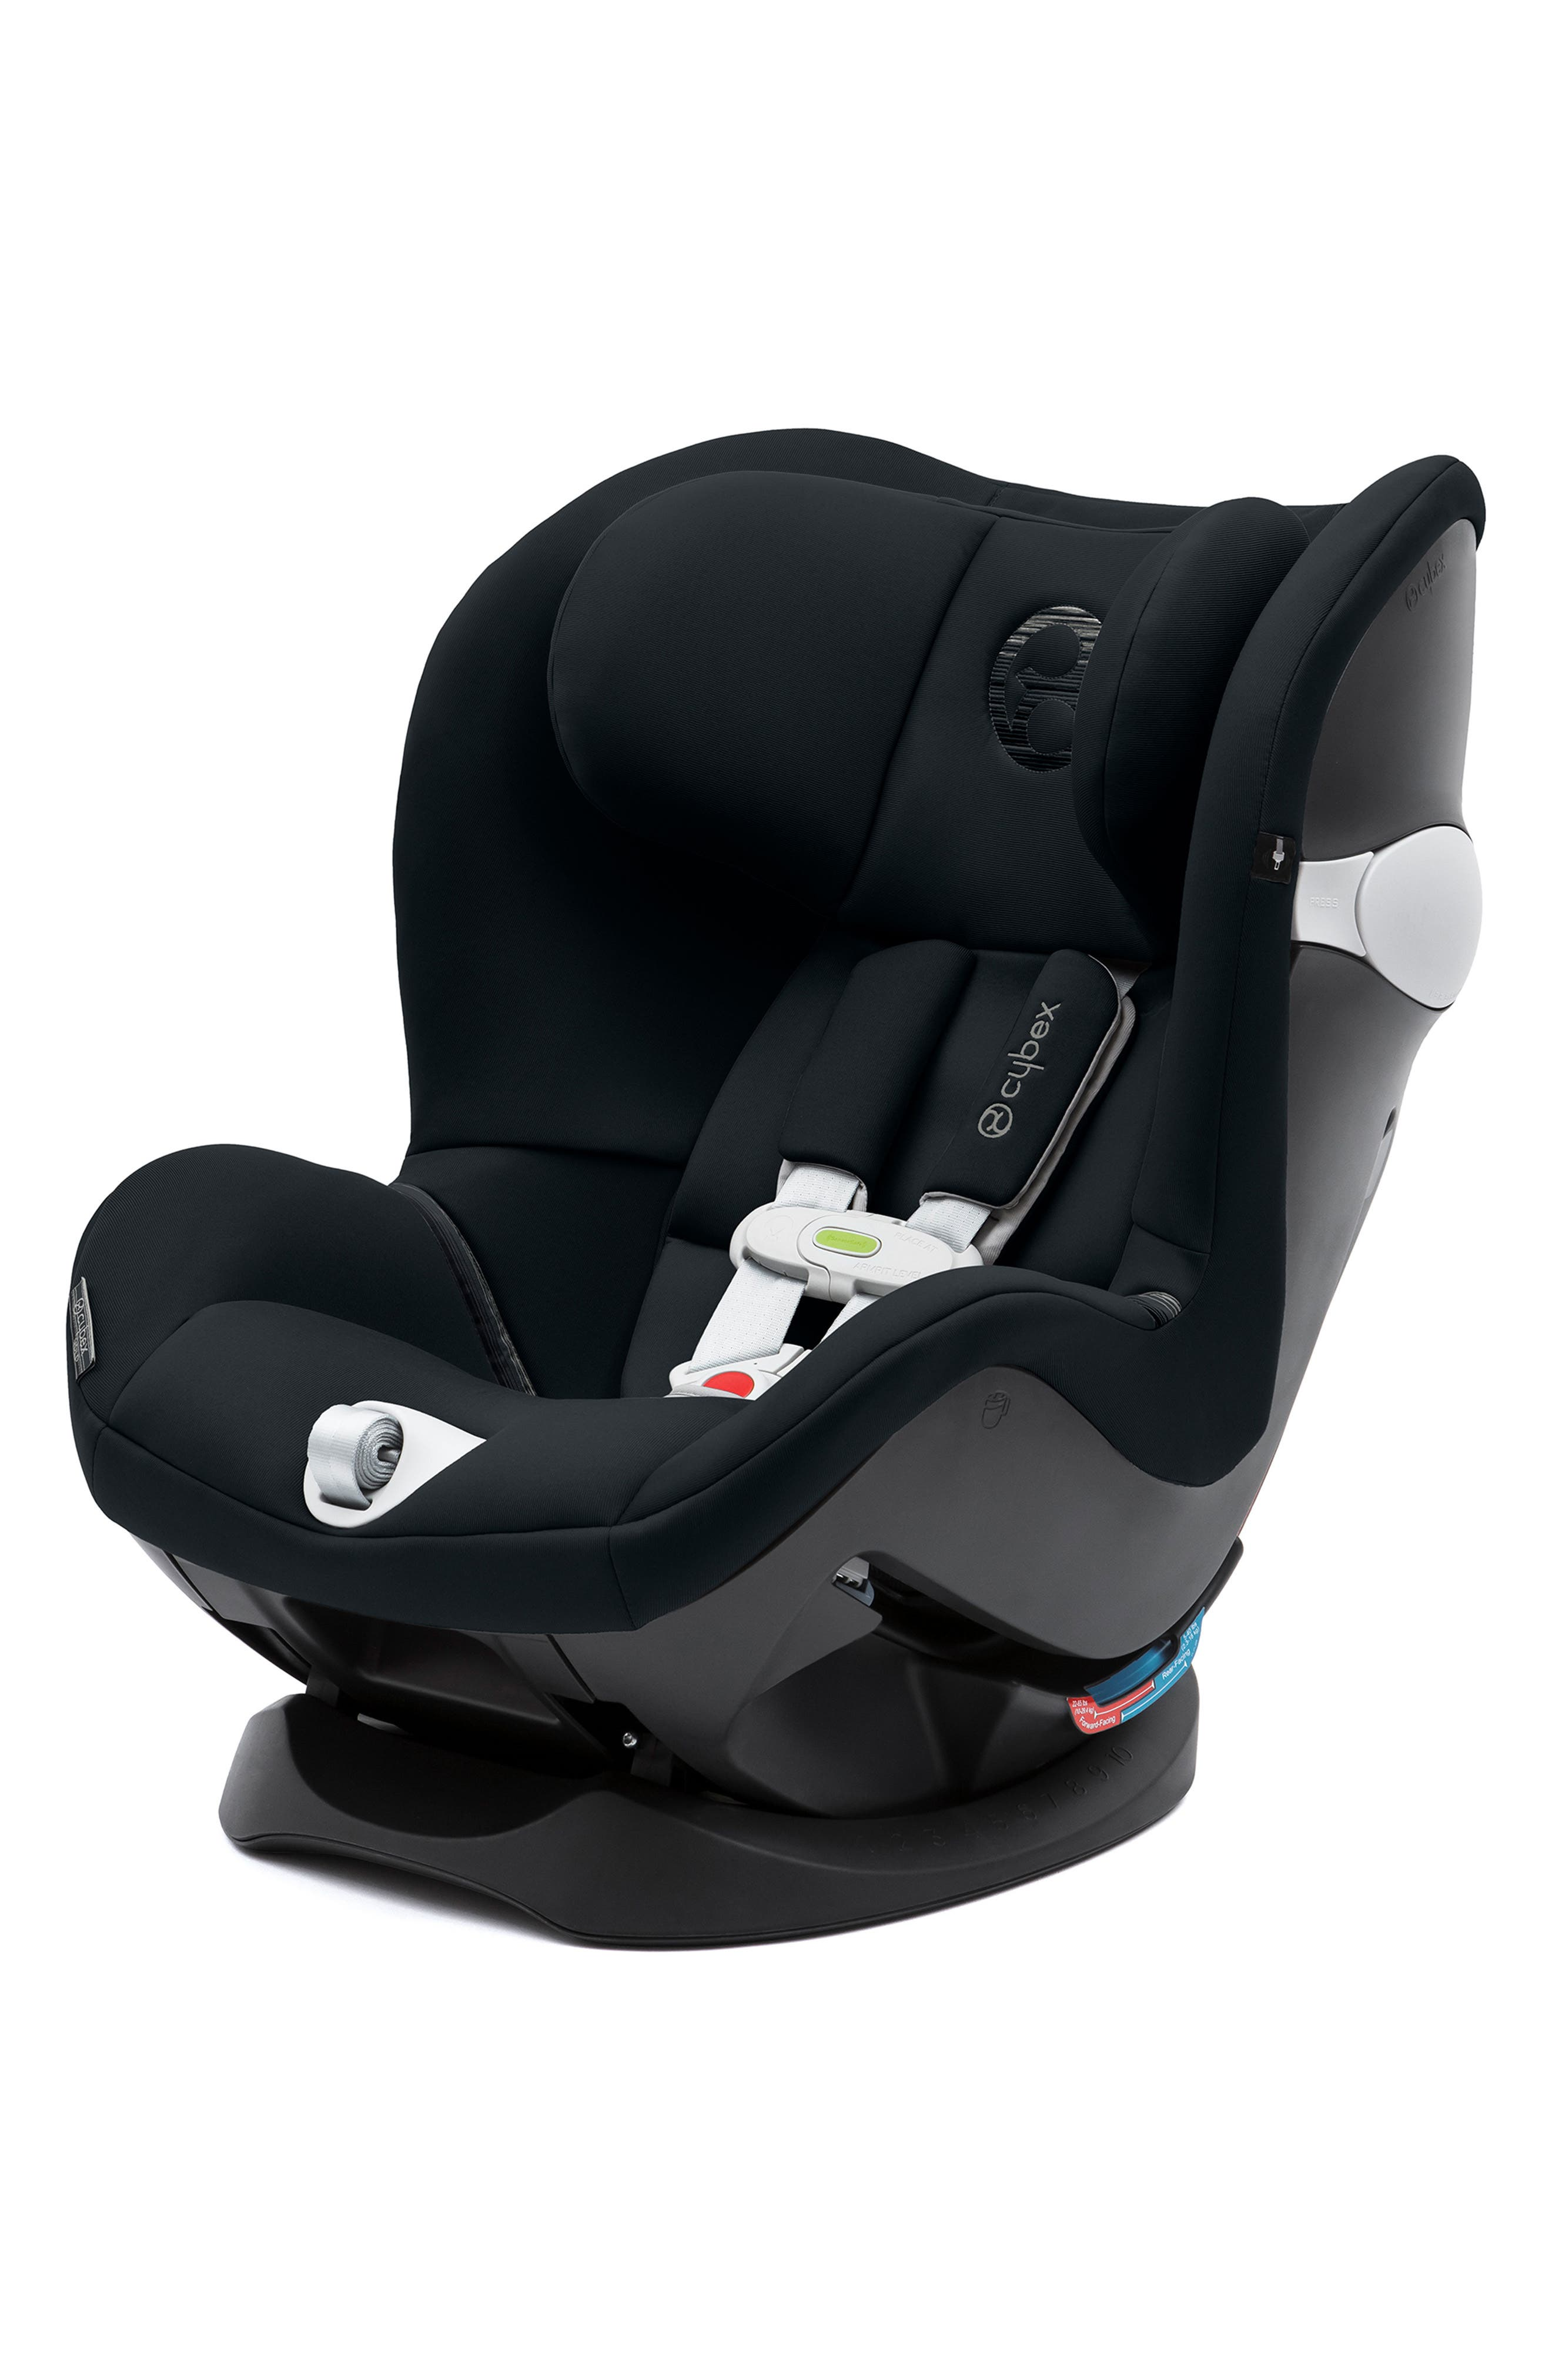 CYBEX Sirona M SensorSafe™ 2.0 Convertible Car Seat